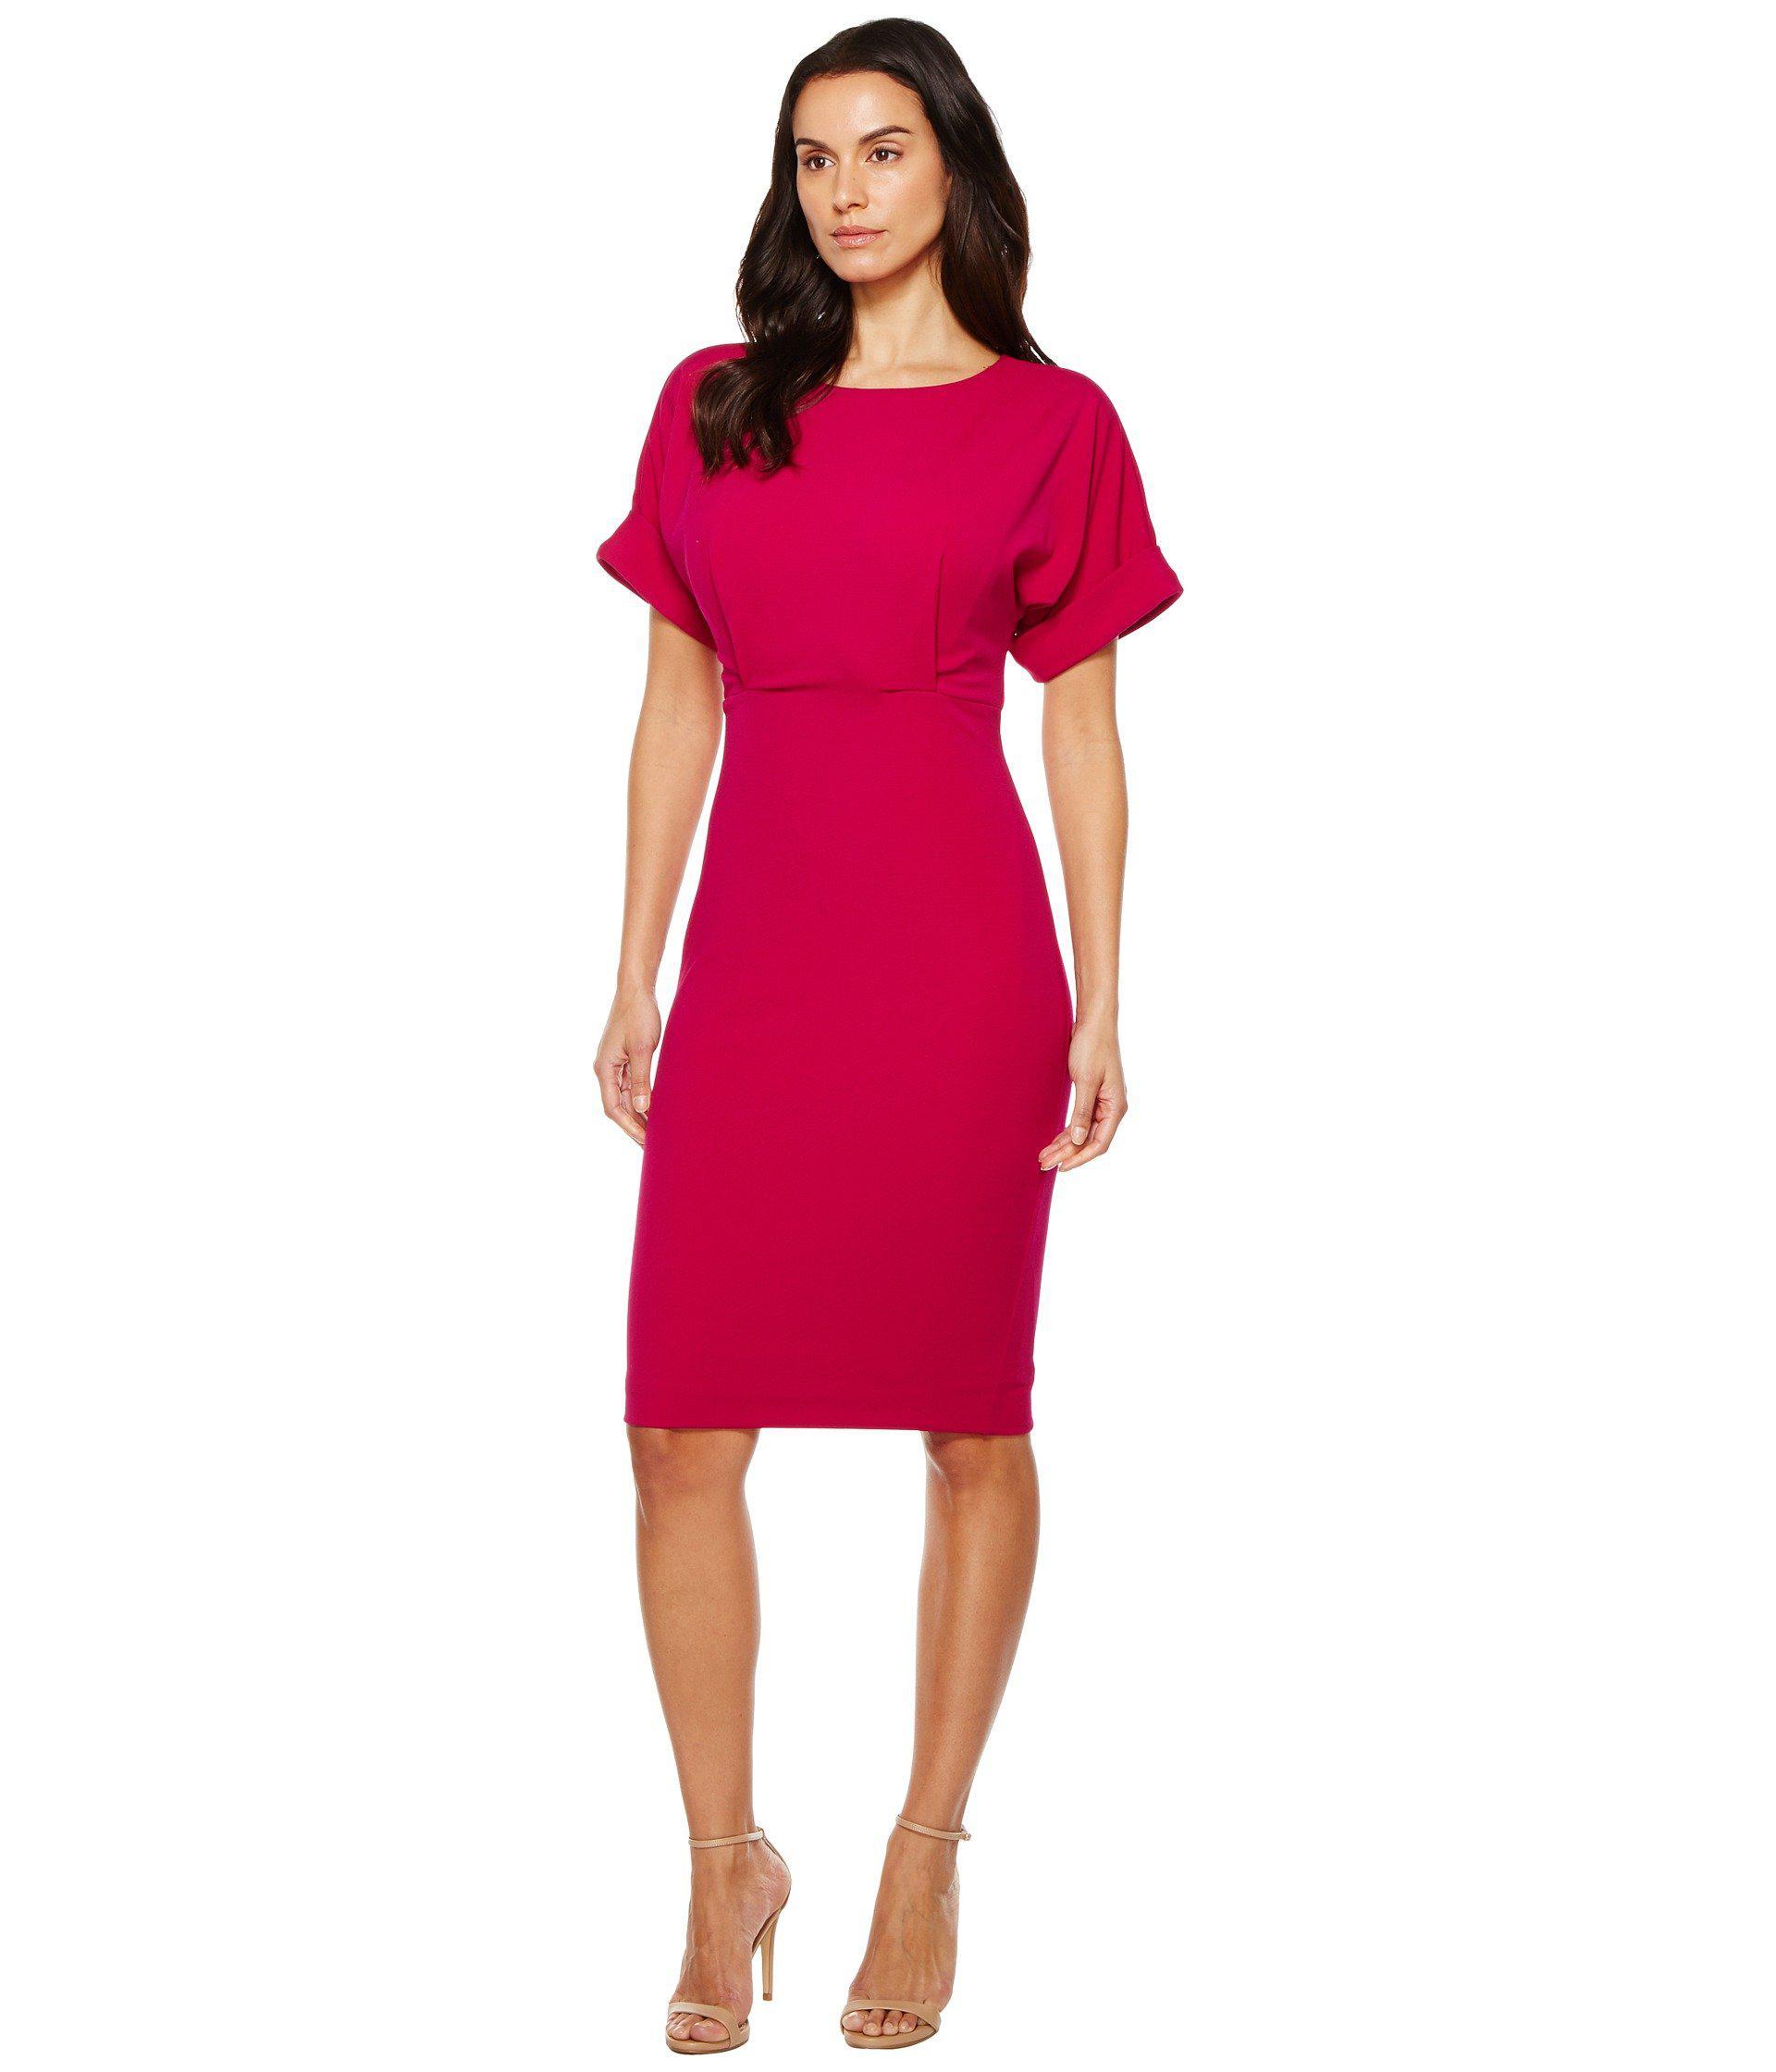 9e5834f1 Lyst - Badgley Mischka Dolman Sheath Dress in Red